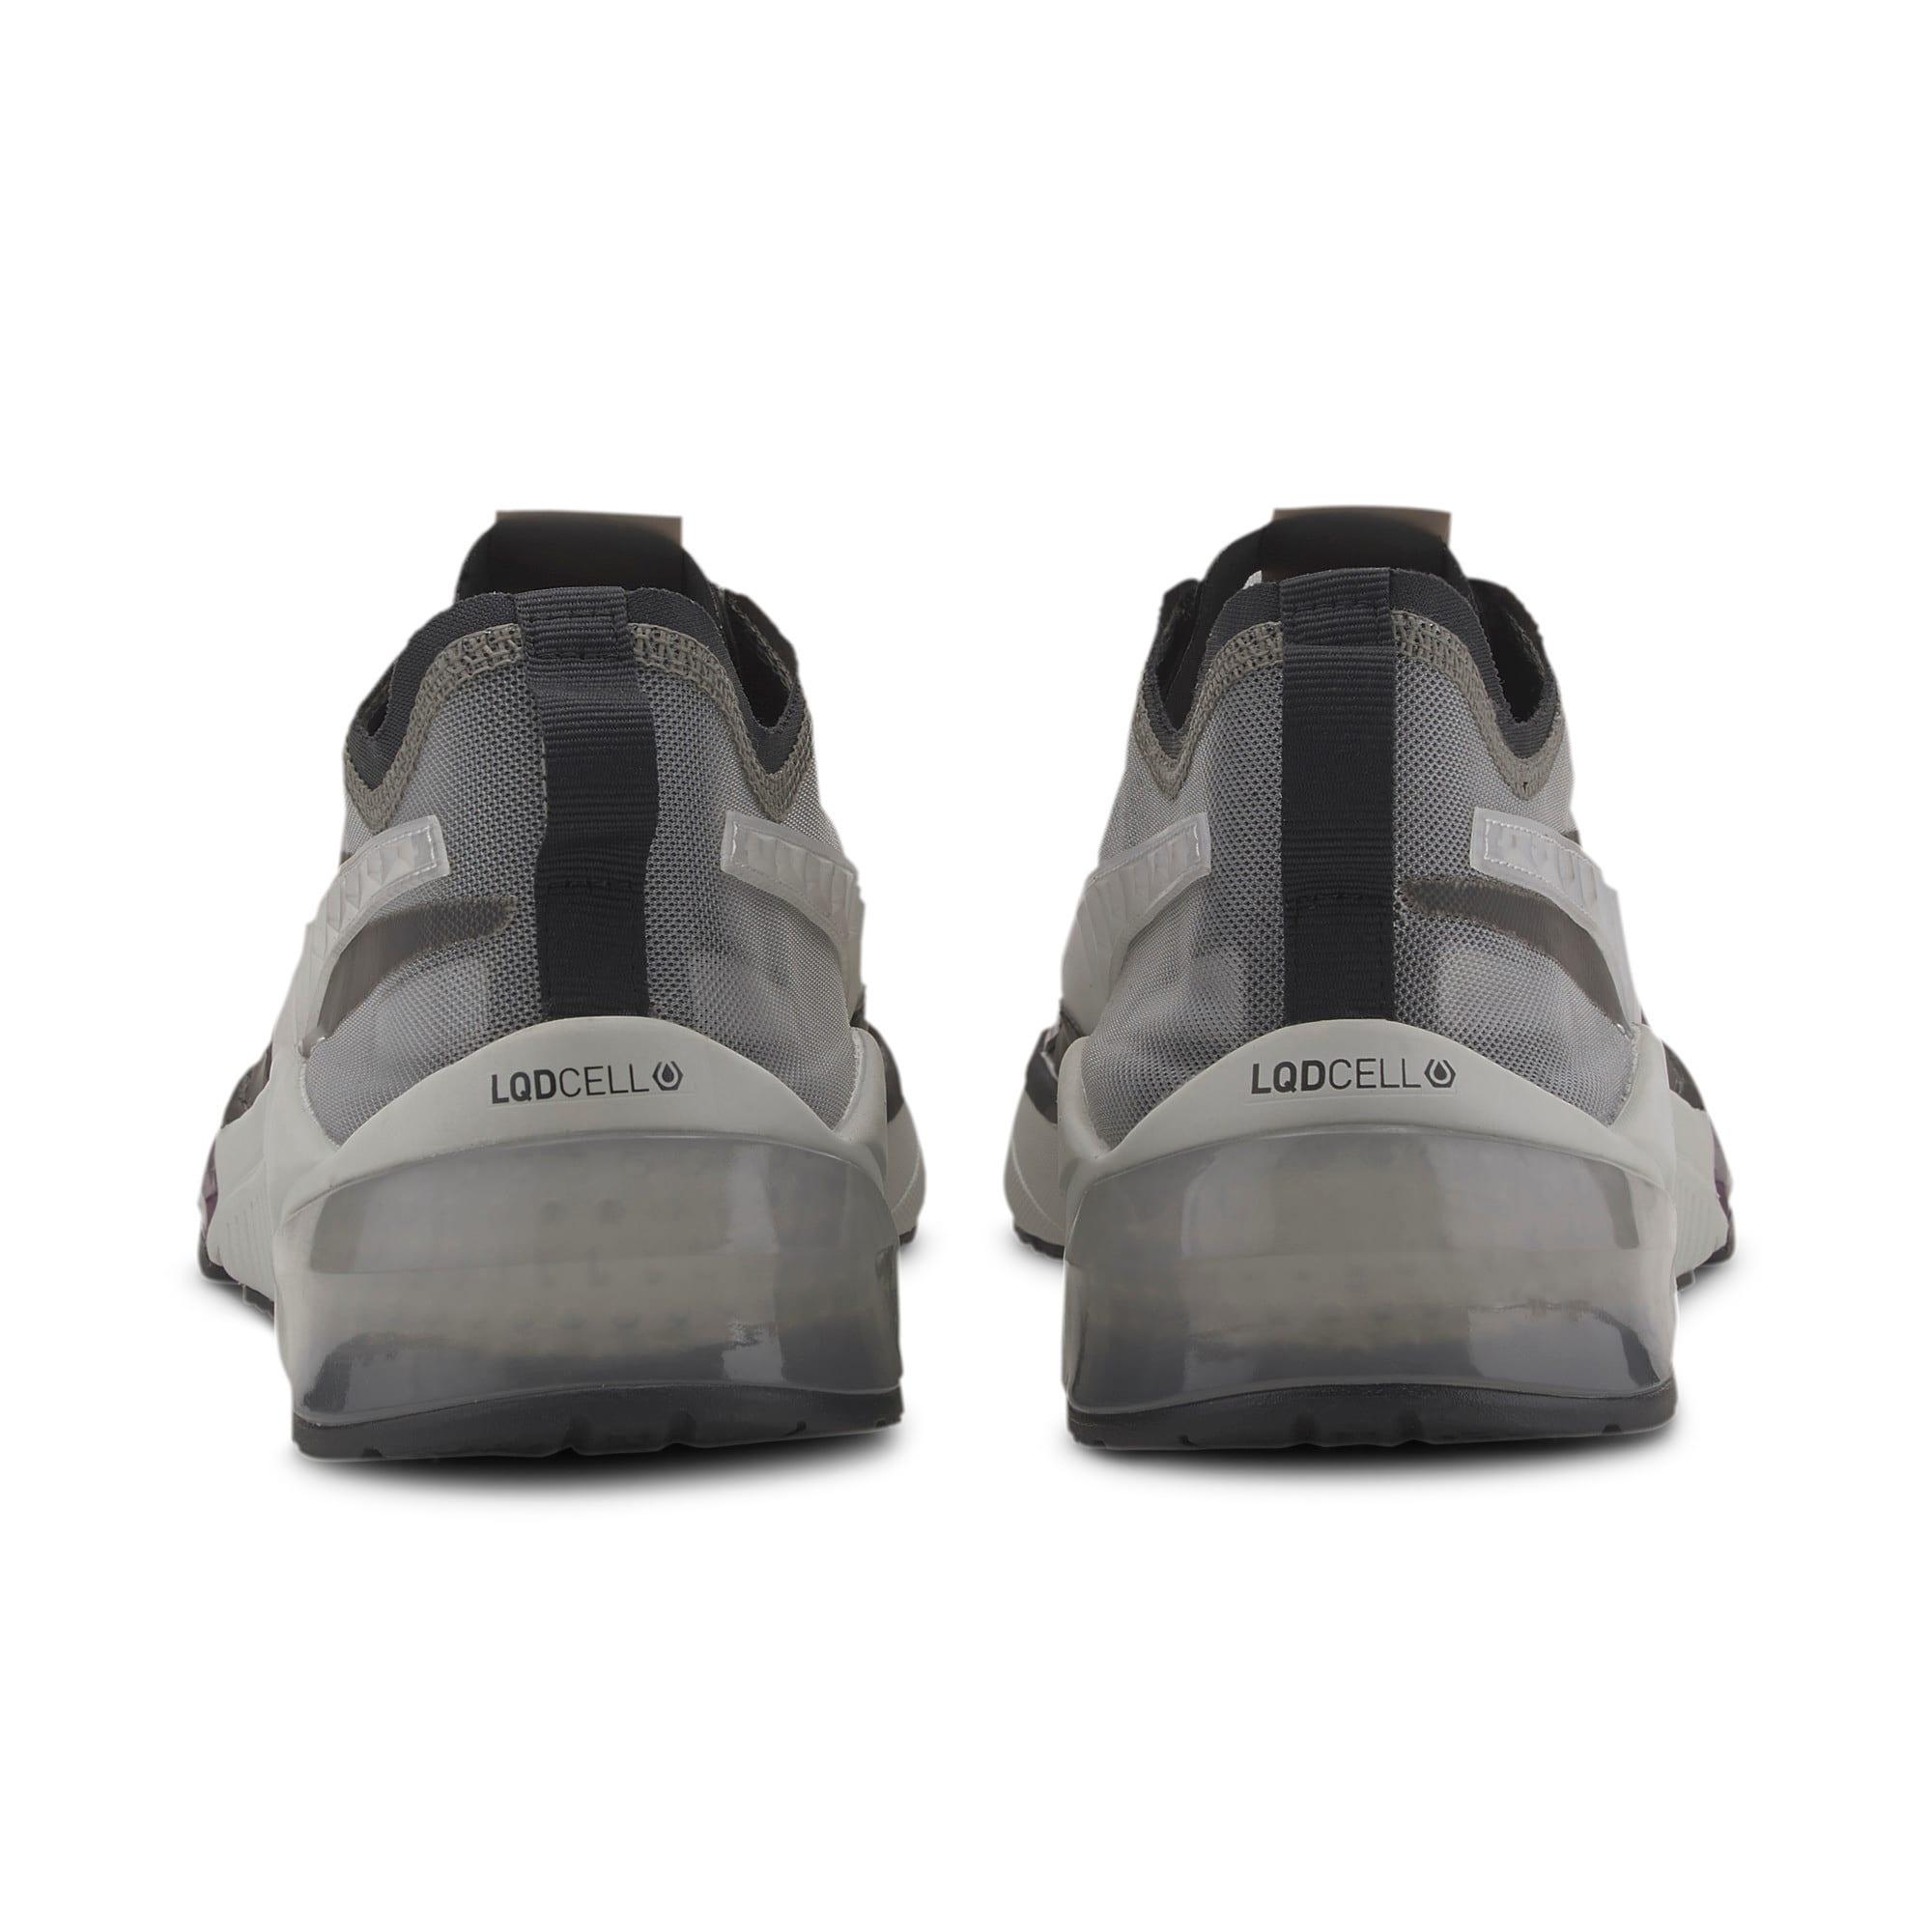 Thumbnail 3 of LQDCELL Optic Sheer Men's Training Shoes, Gray Violet-Puma Black, medium